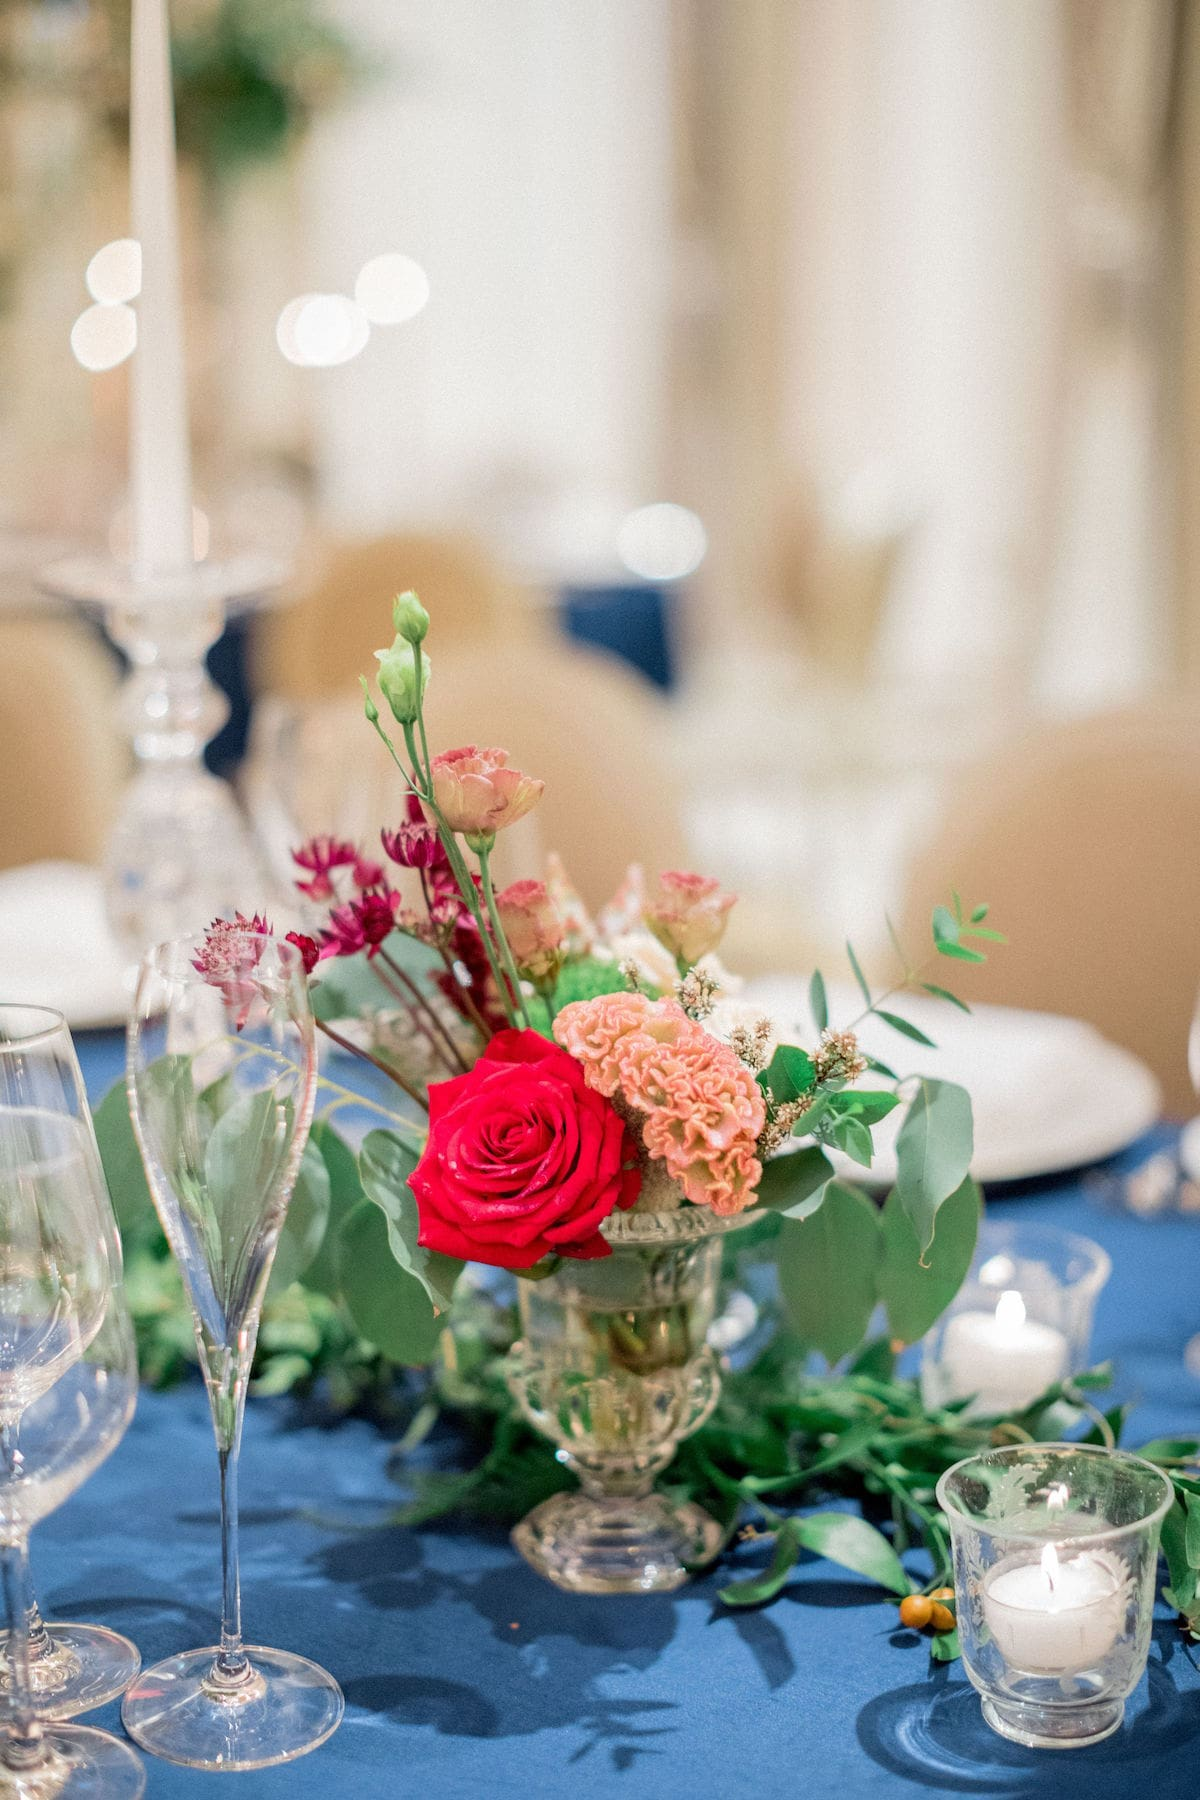 Small centerpiece with navy tablecloth wedding décor